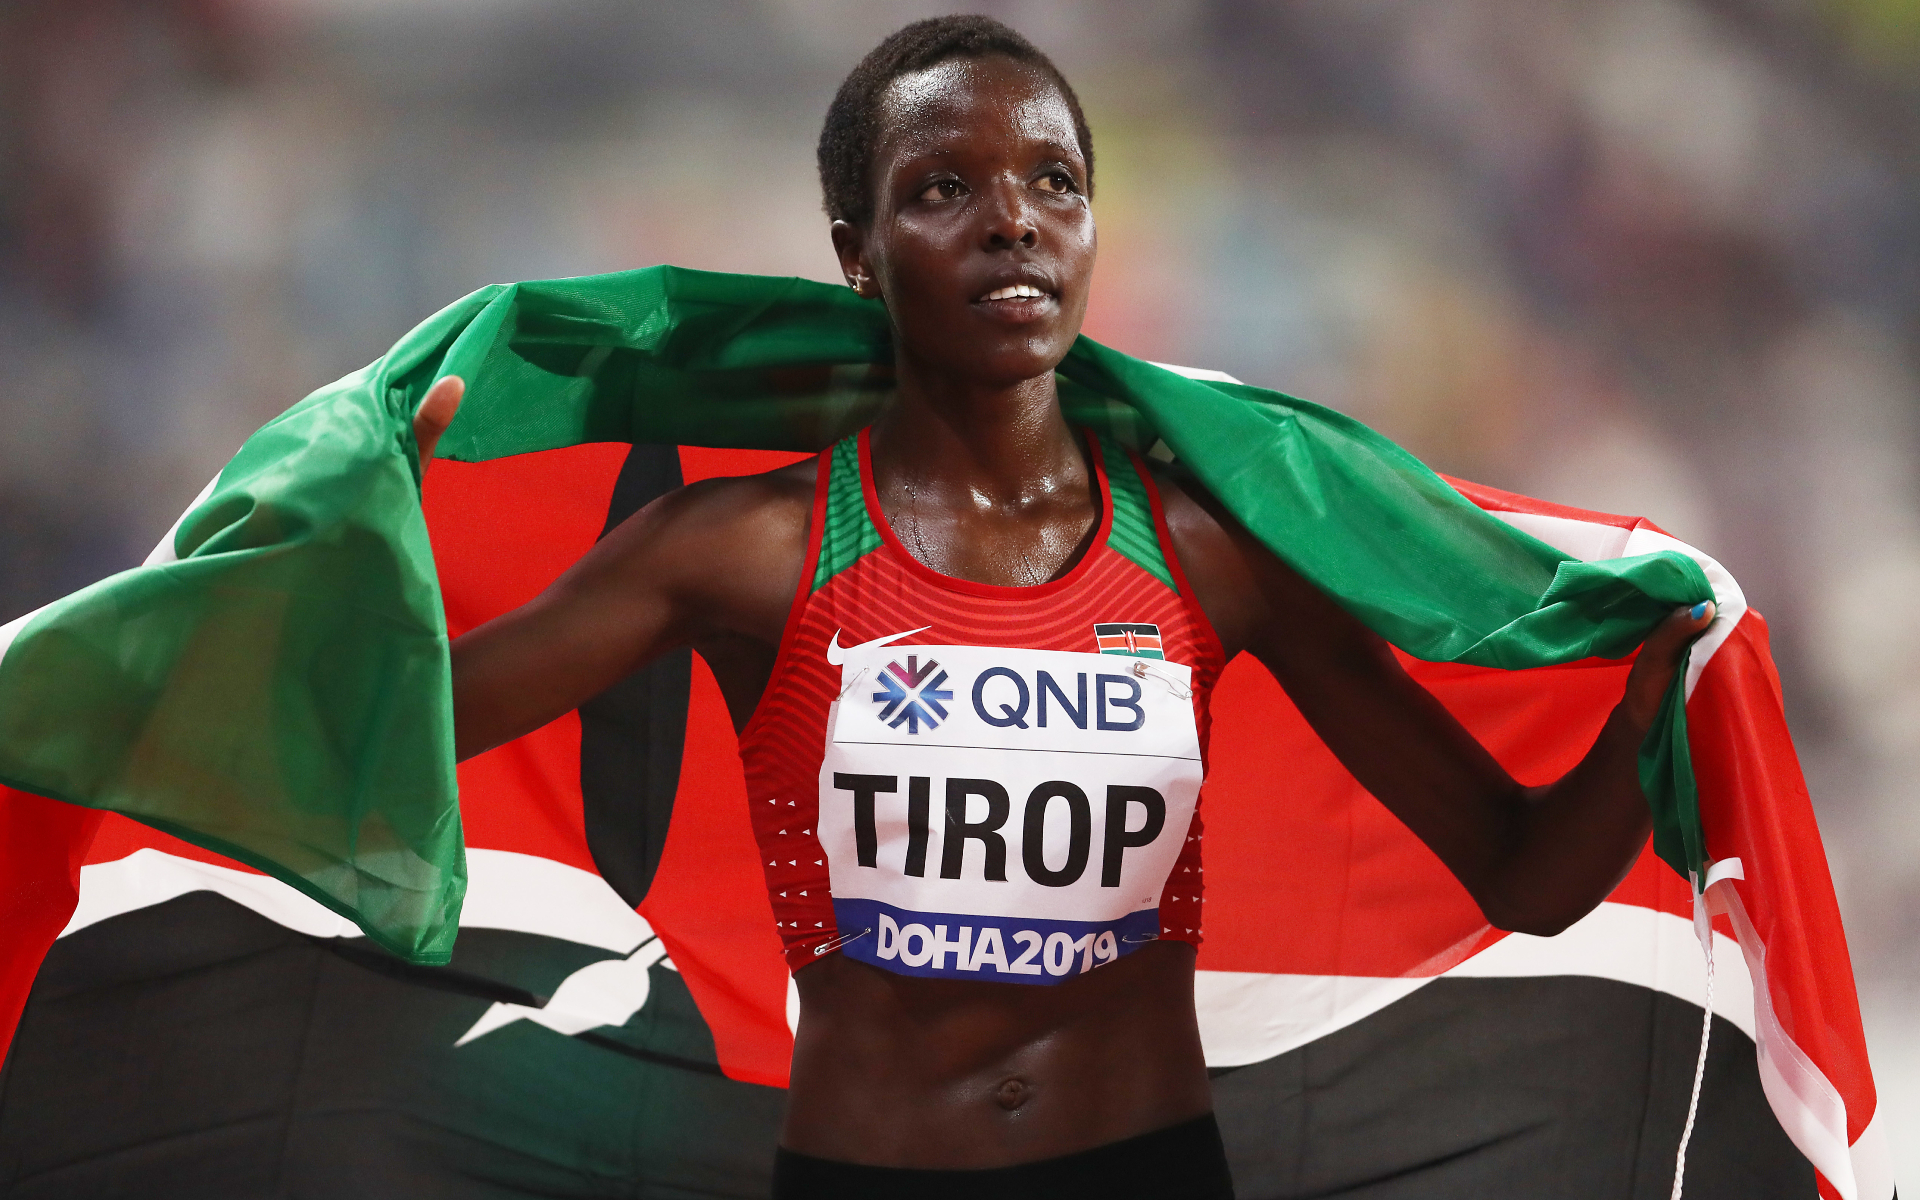 Фото: Alexander Hassenstein/Getty Images for IAAF